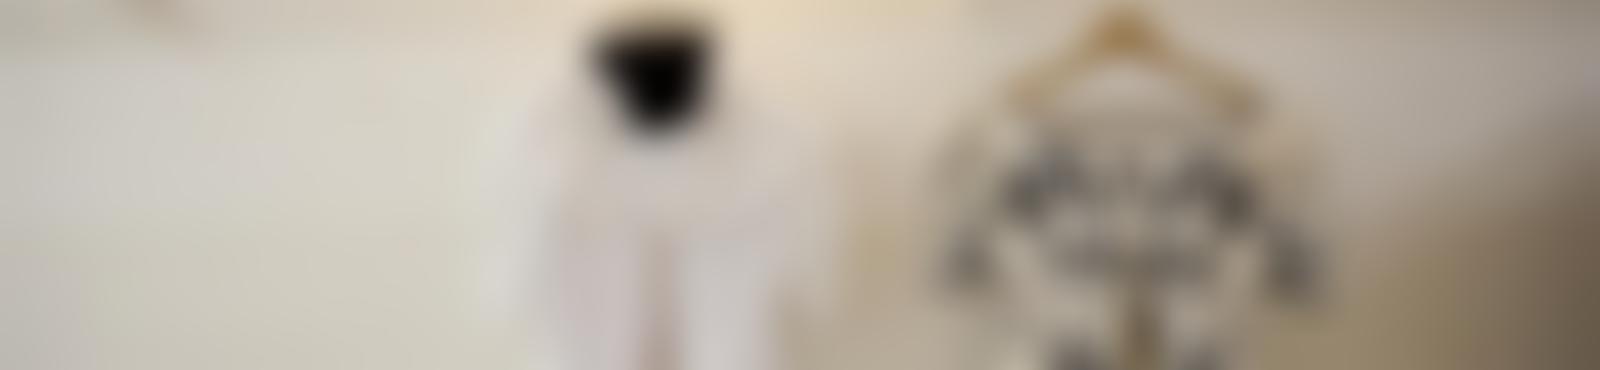 Blurred af8f8b97 0c98 4b7a aed4 90039ecdee2d